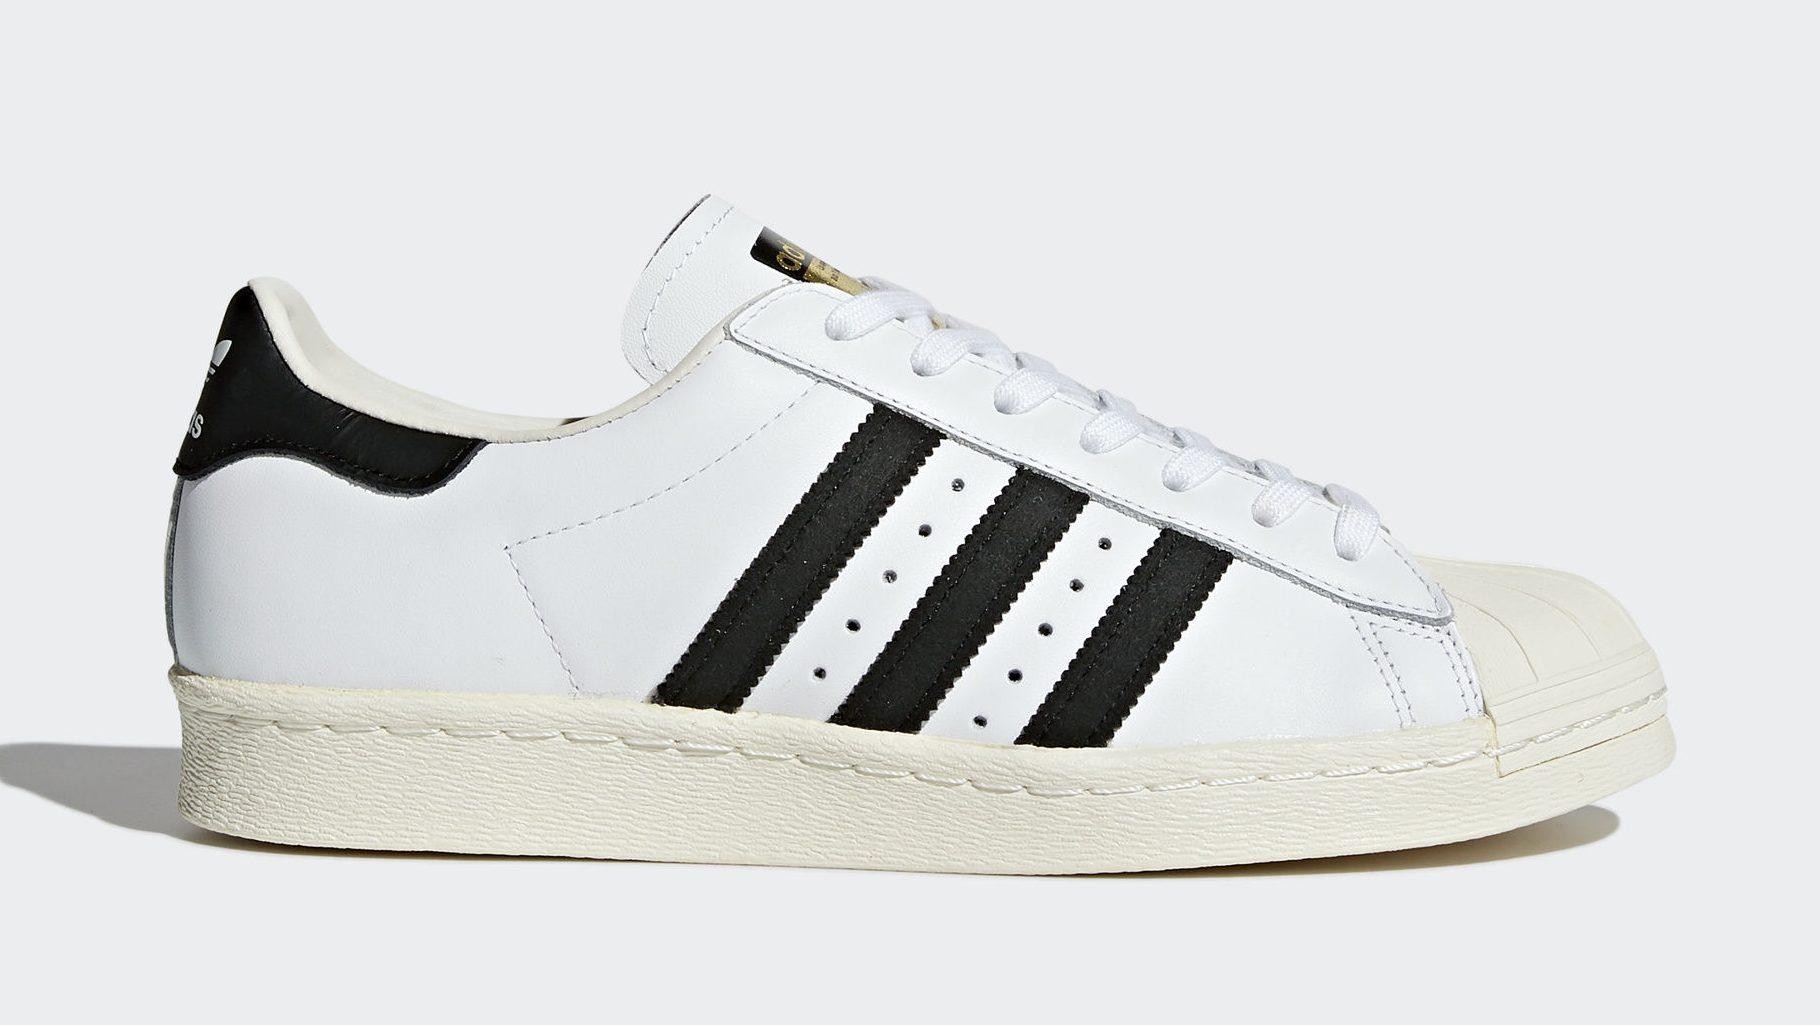 Adidas Superstar 80 G61070